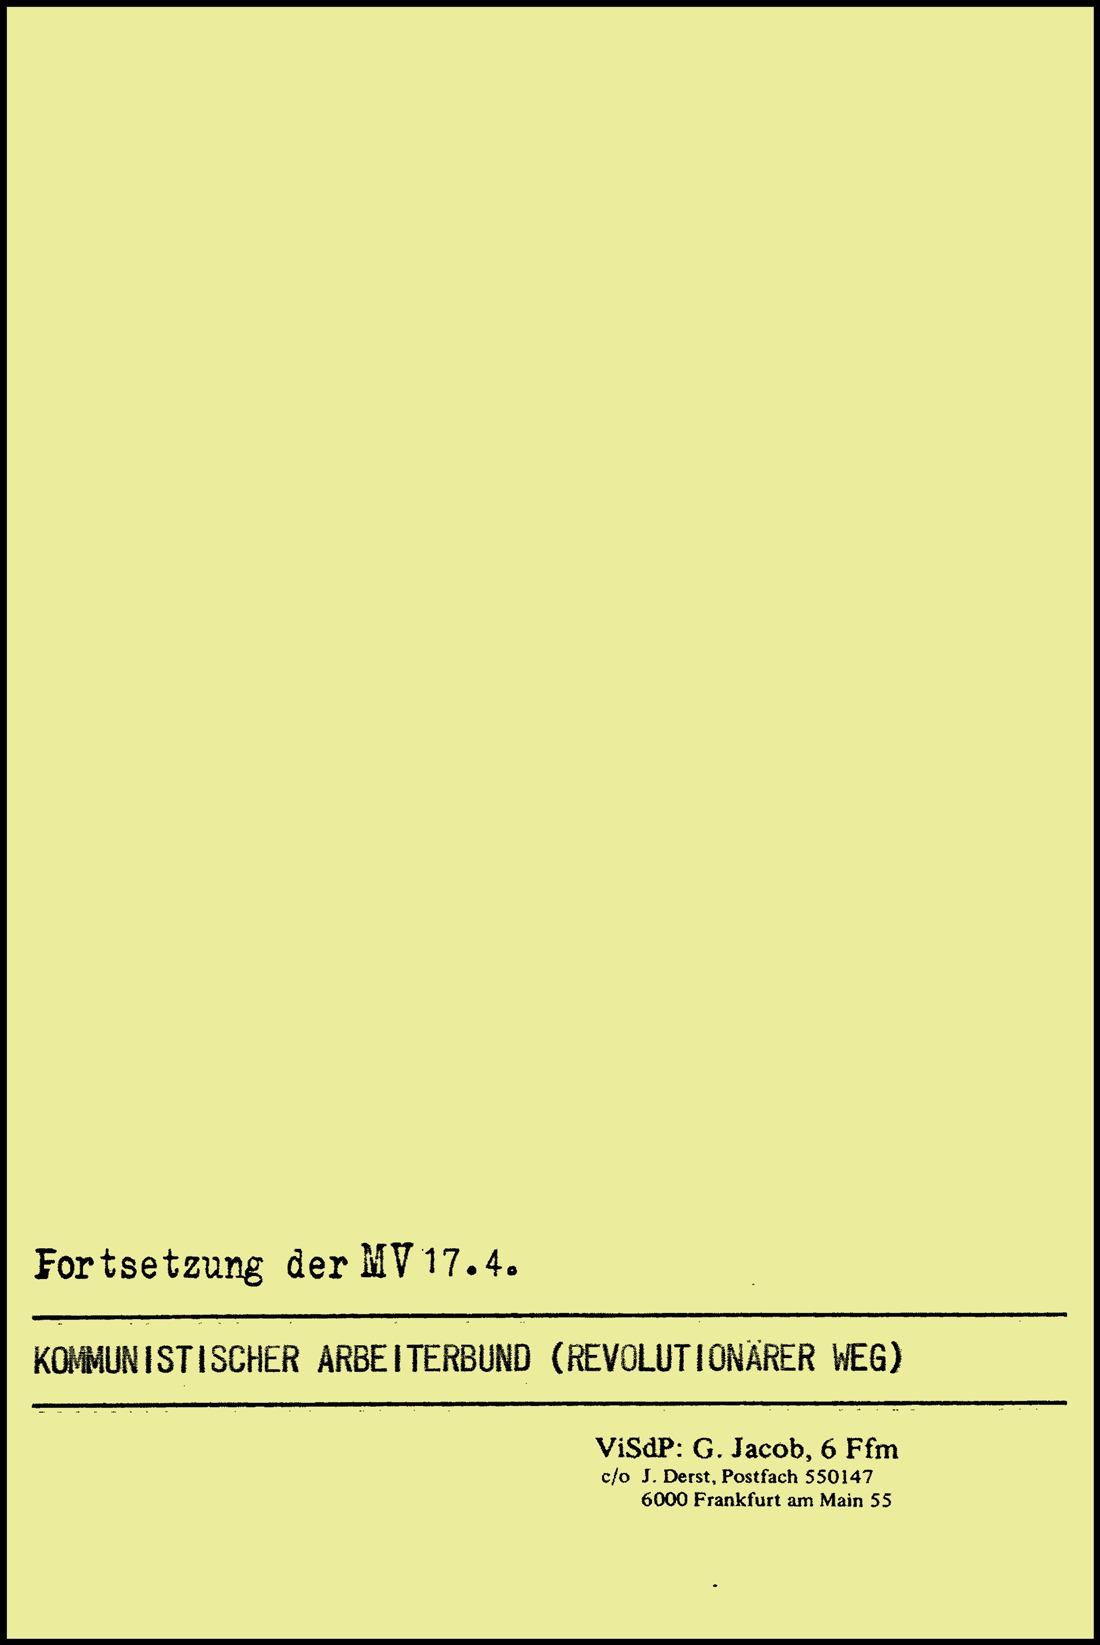 KABRW_MV_19770402_034